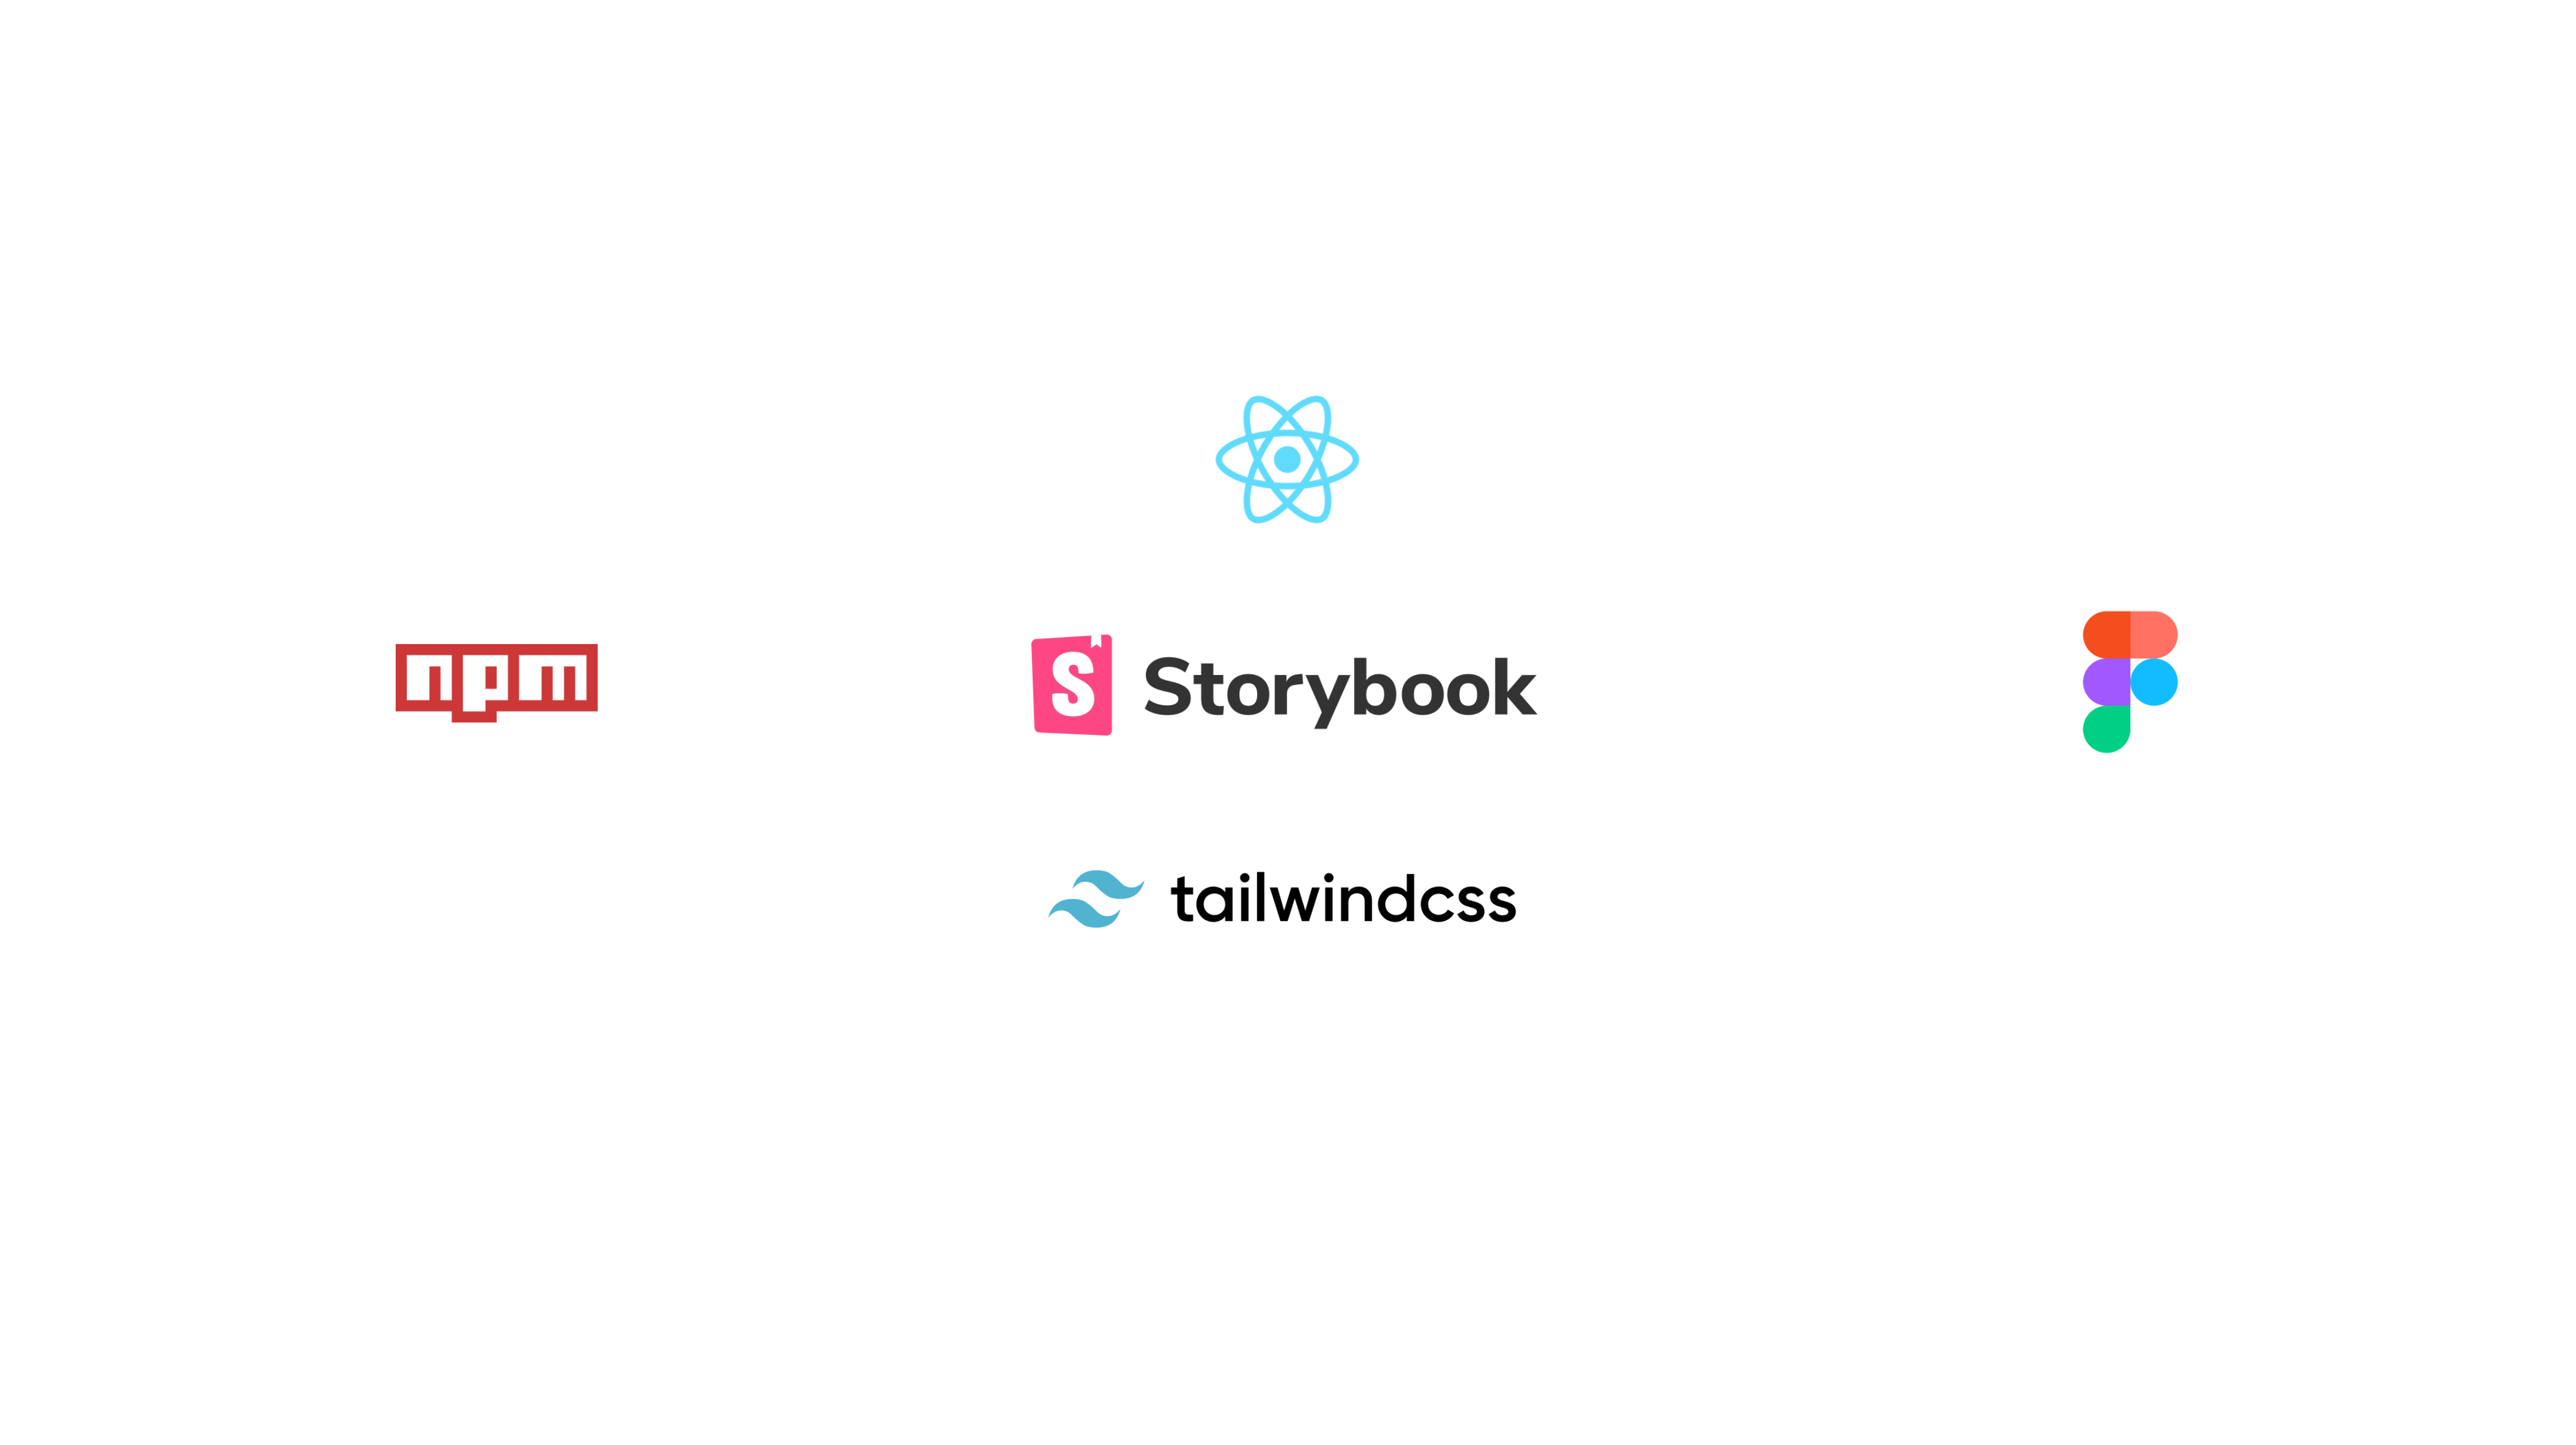 Photo of company logos (npm, storybook, react, tailwindcss, figma)